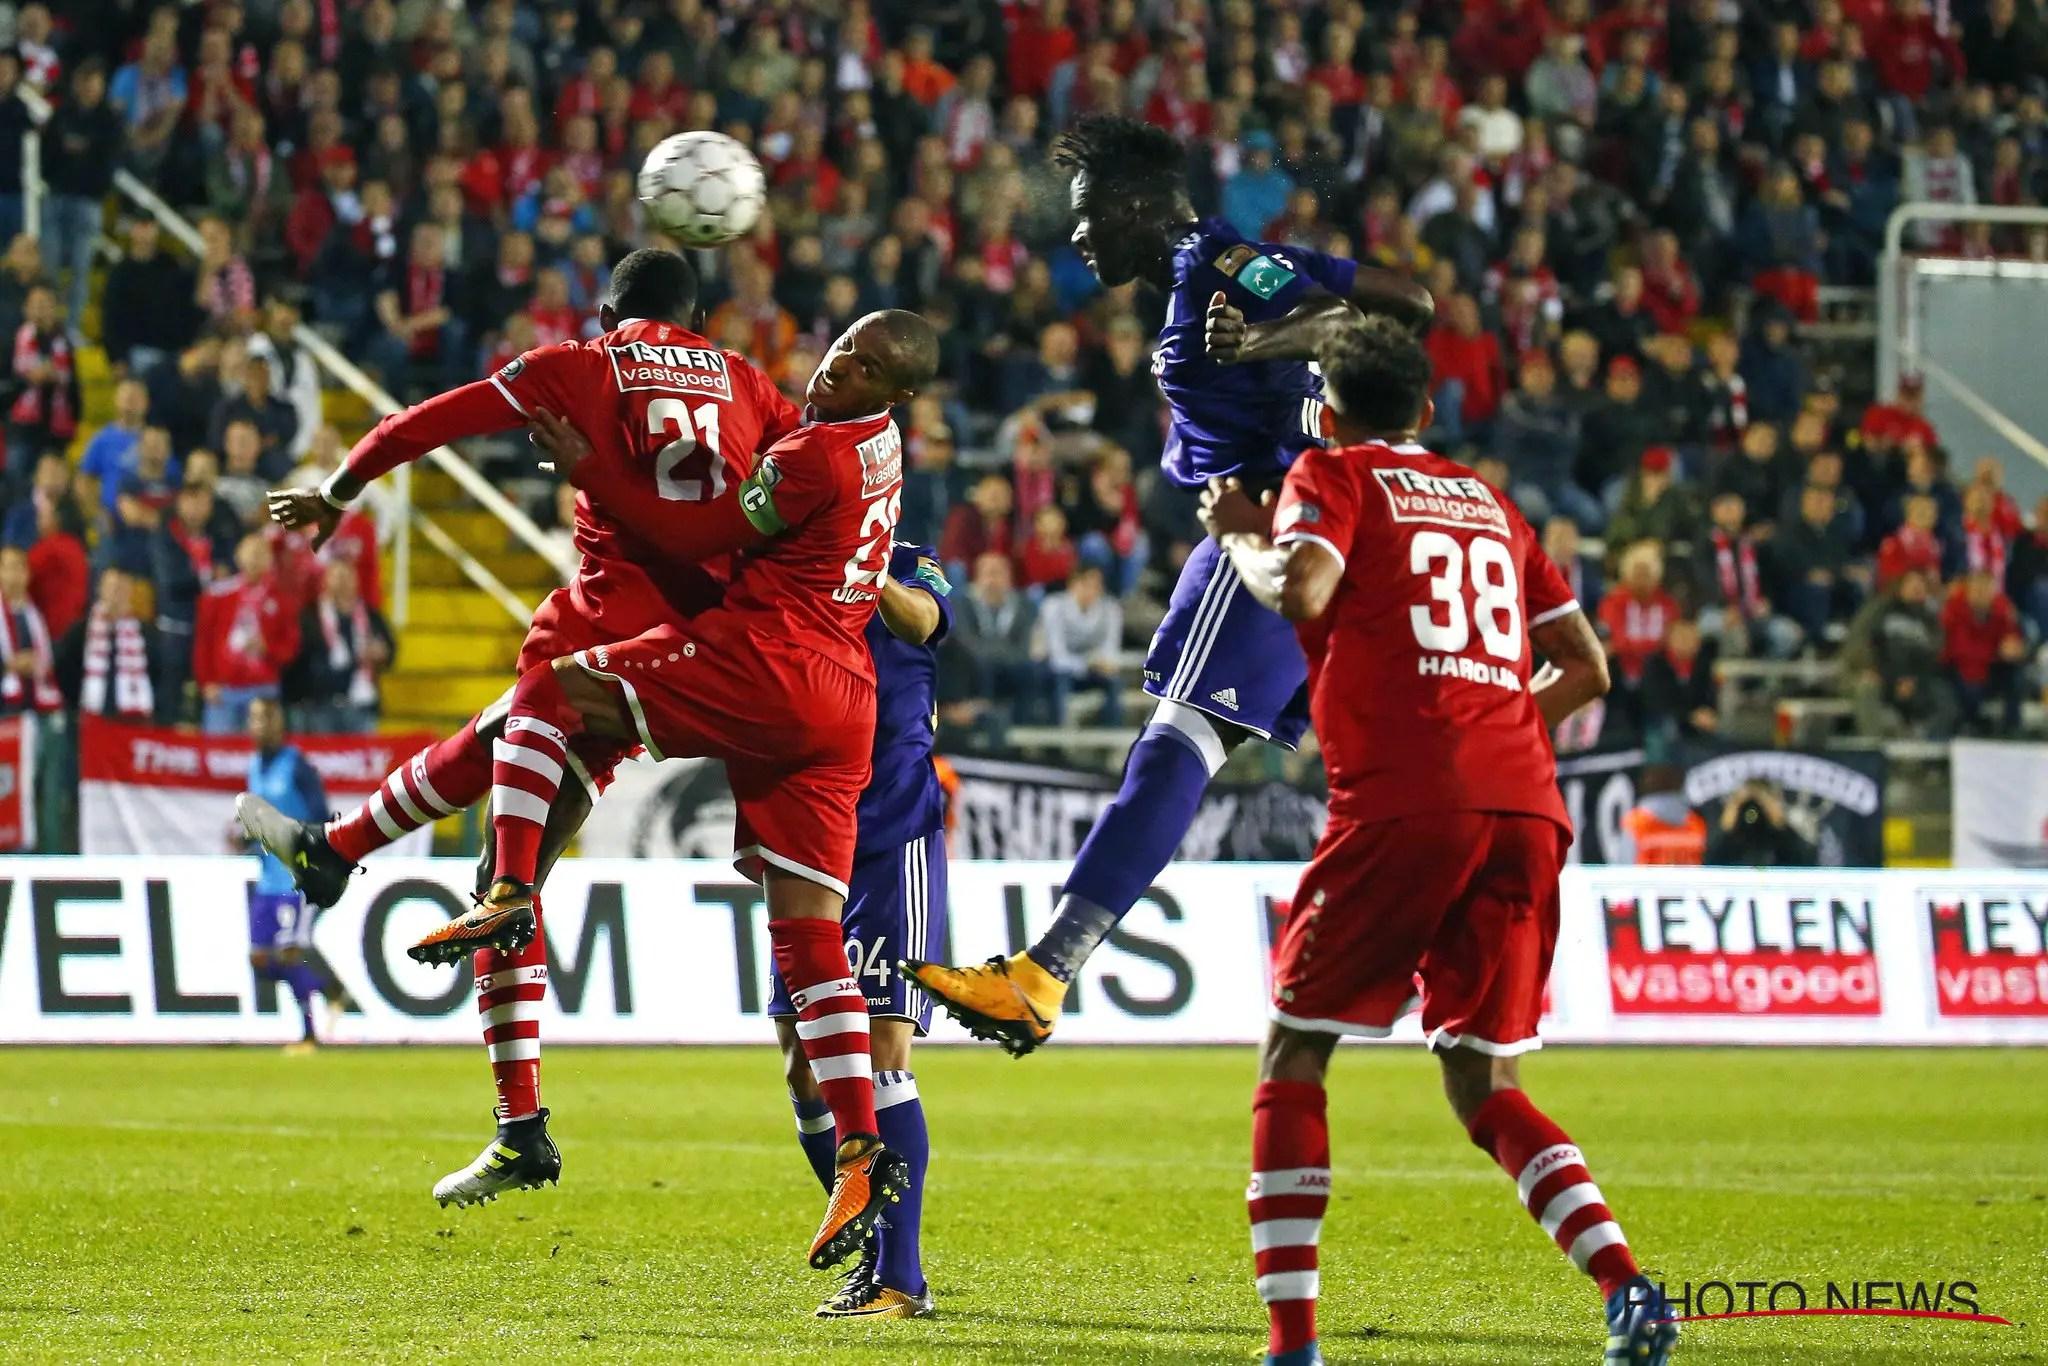 Onyekuru Benched As Anderlecht Can't Score In League Opener